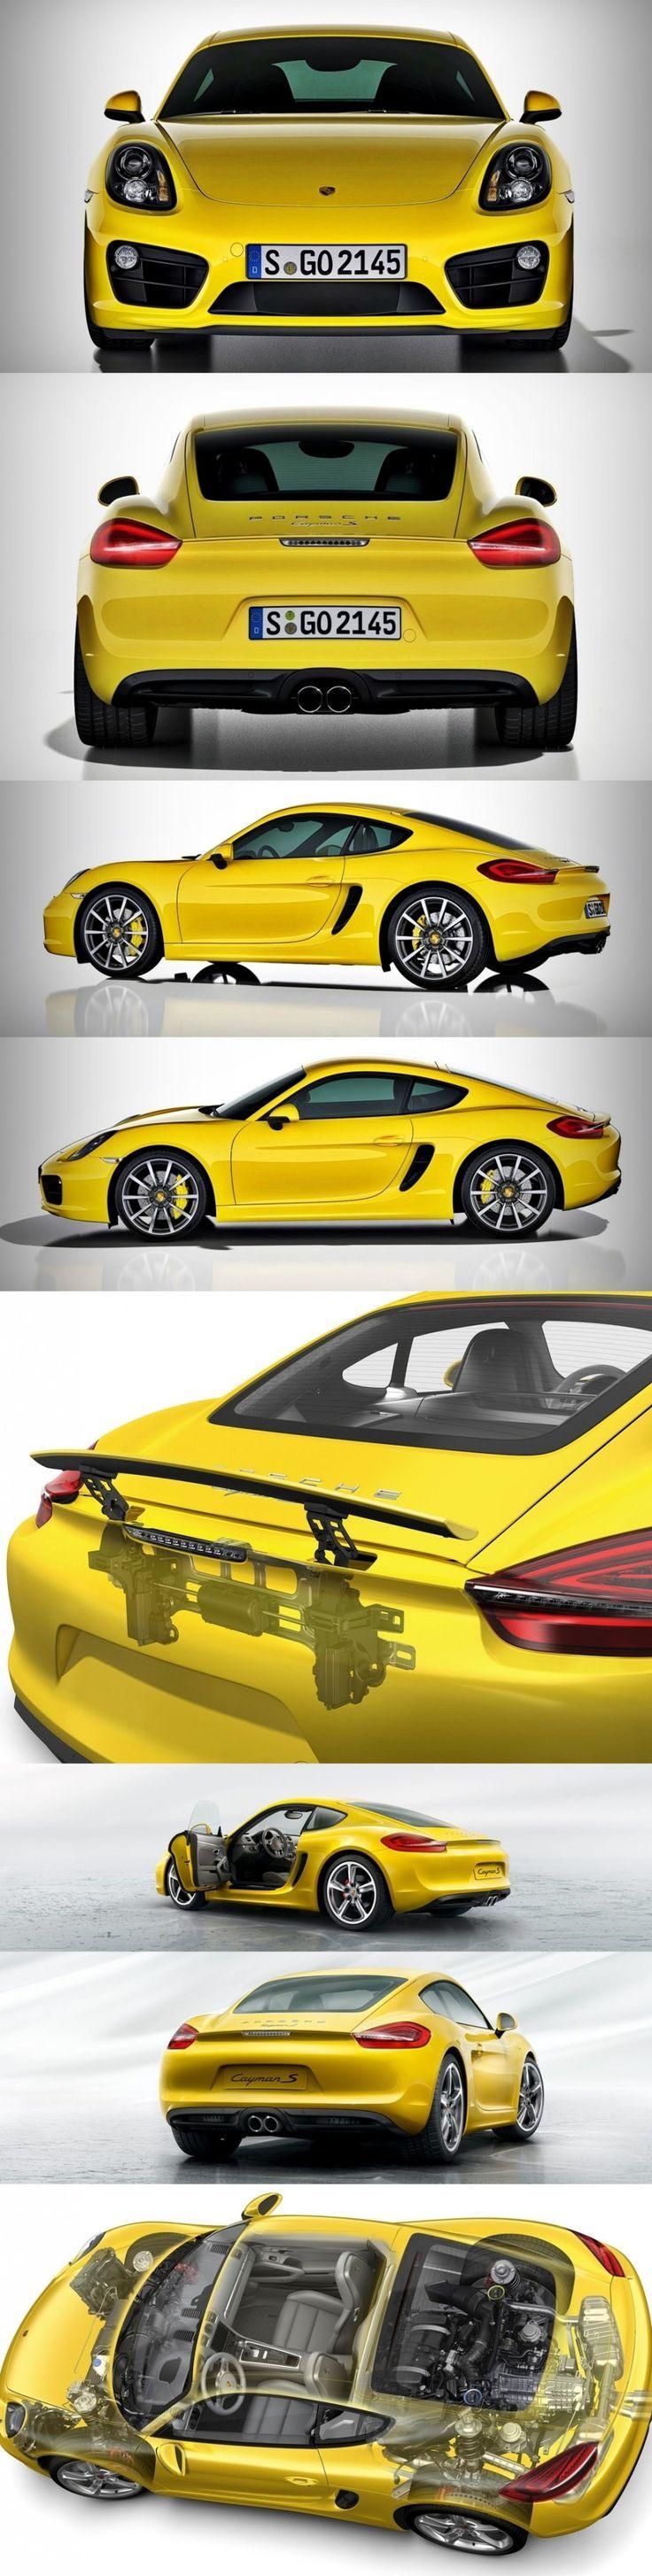 72c29046dcc228a8c00573e8d08a6825 Stunning Ficha Tecnica Porsche 918 Spyder Concept Cars Trend